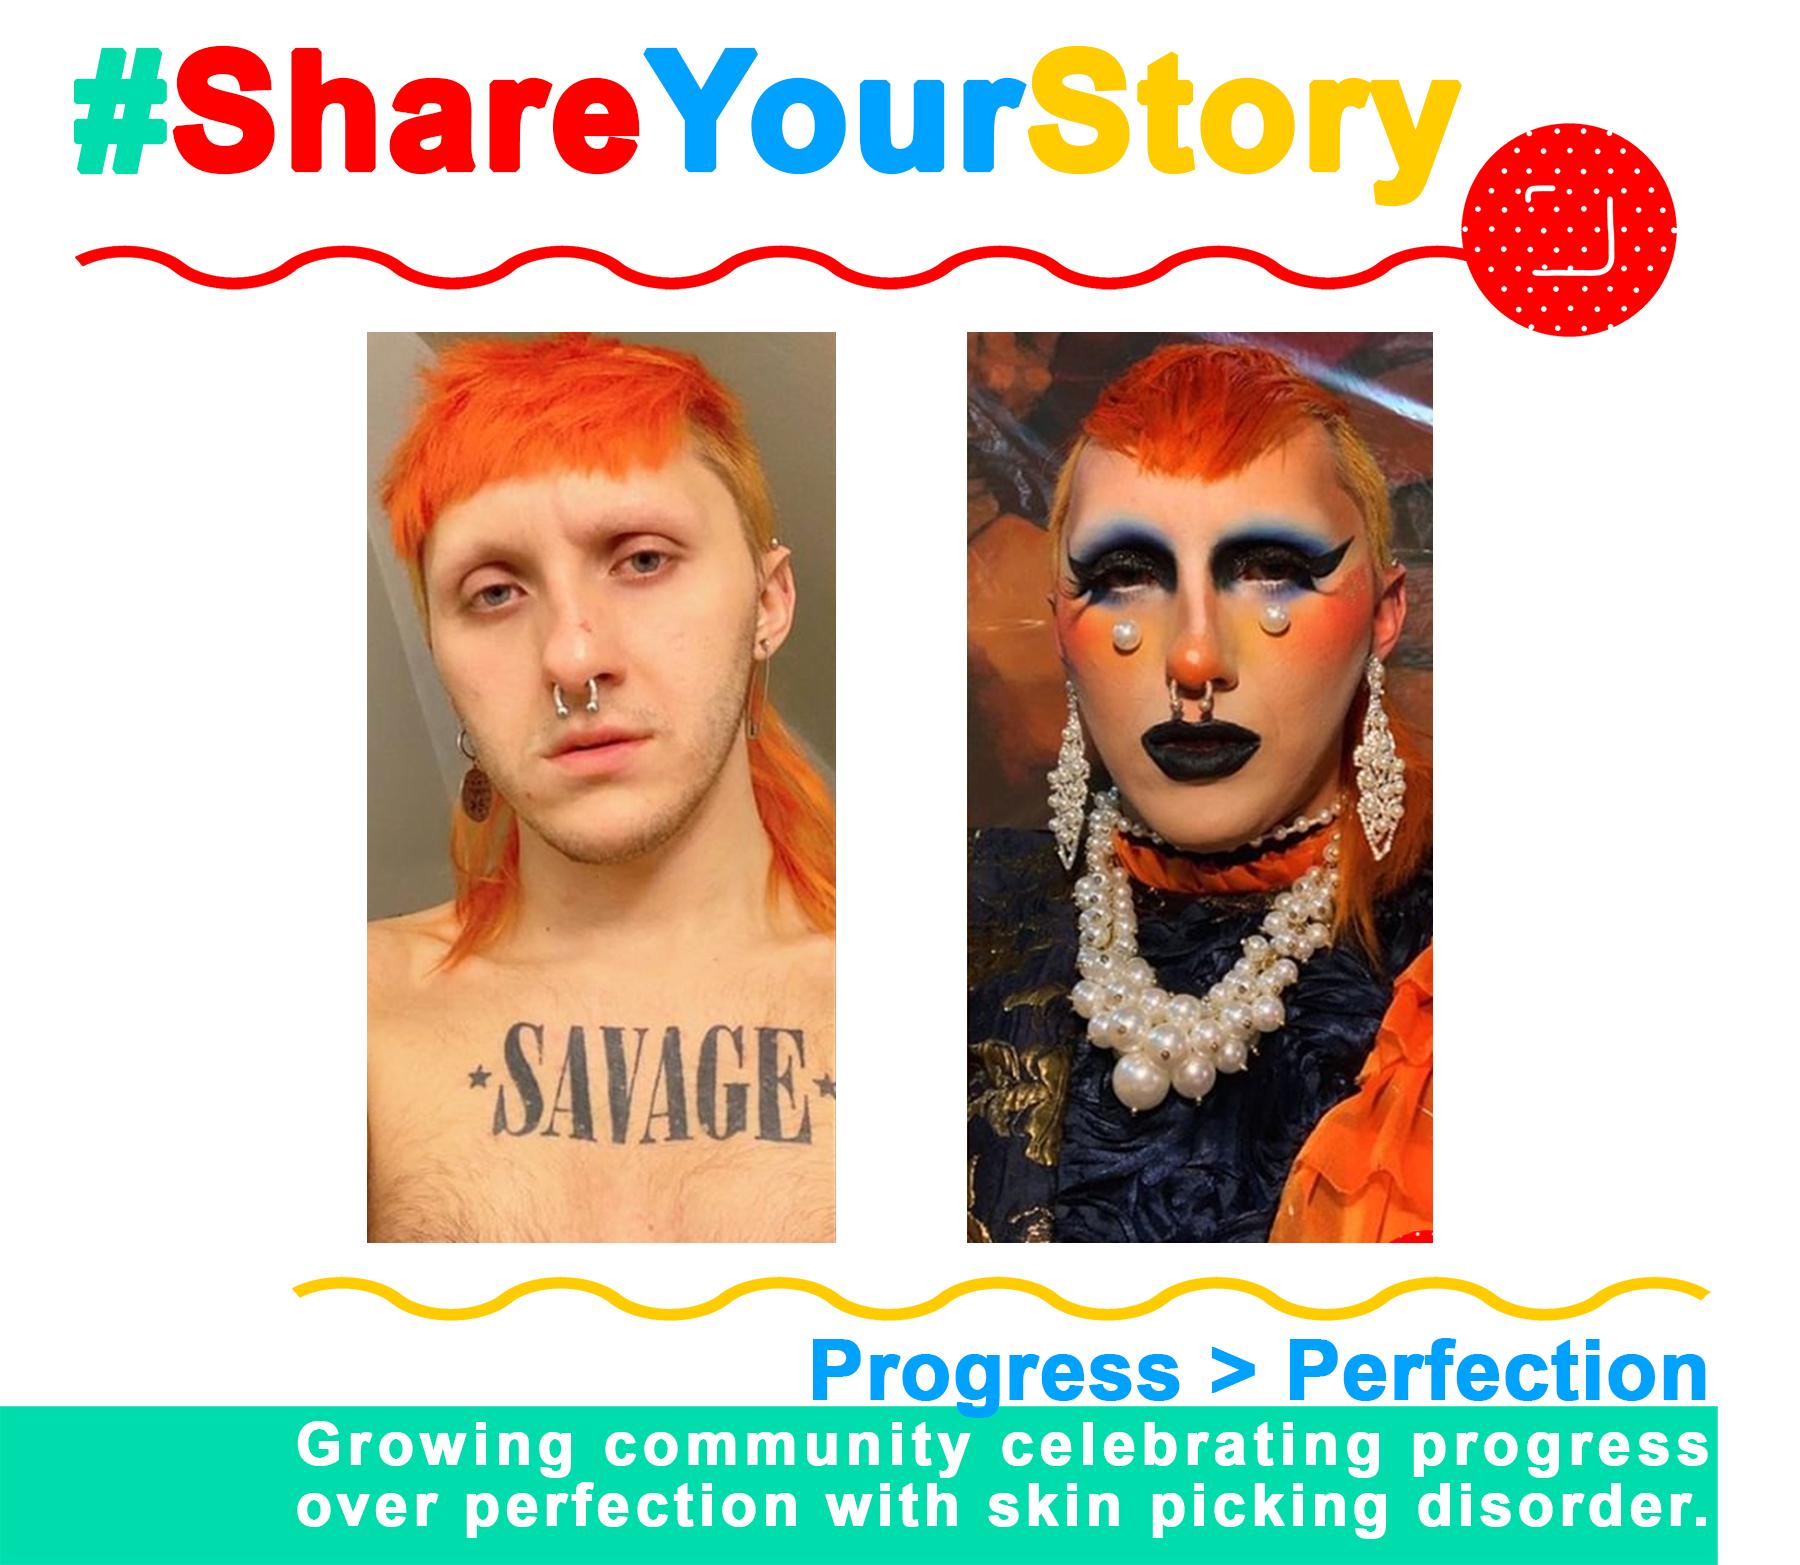 #ShareYourStory: Qhrist